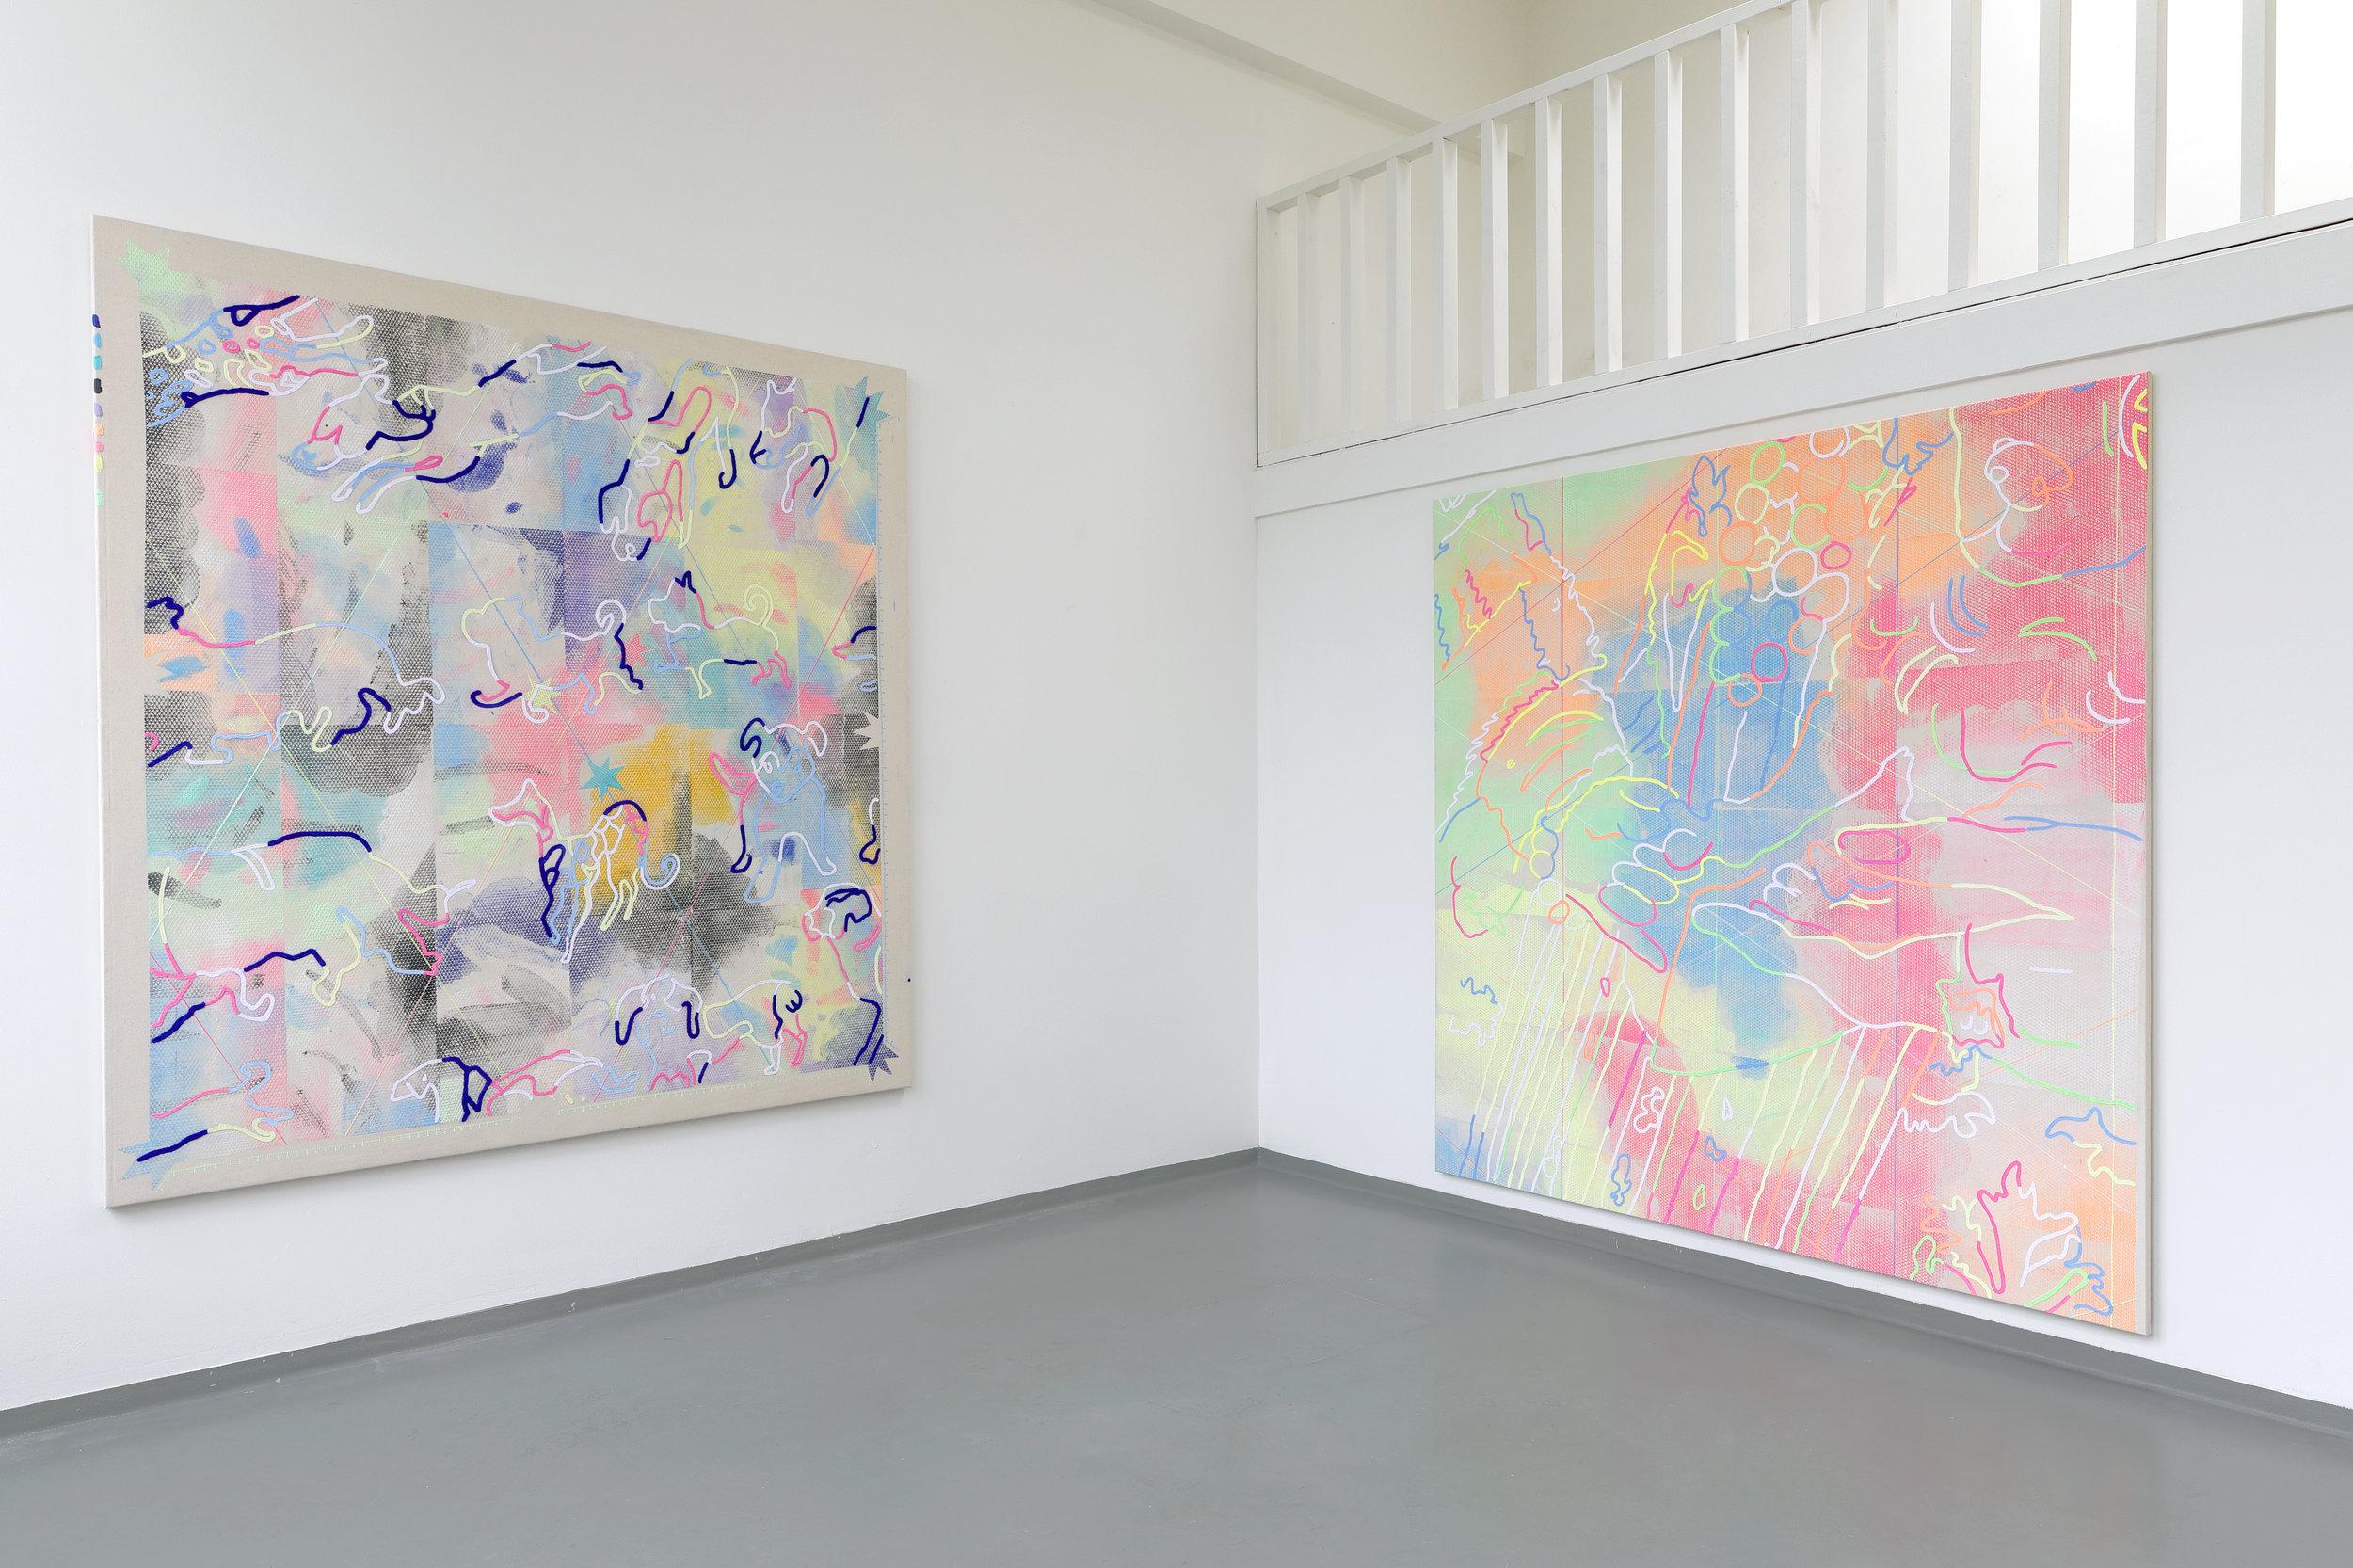 Threadingdoek: Doggies + Threadingdoek: Bianca Degli Utili Maselli holding a dog and surrounded by six of her children - Mixed media, 190x 200 cm, 190 x 200 cm, Van Eyck Open Studio's 2019